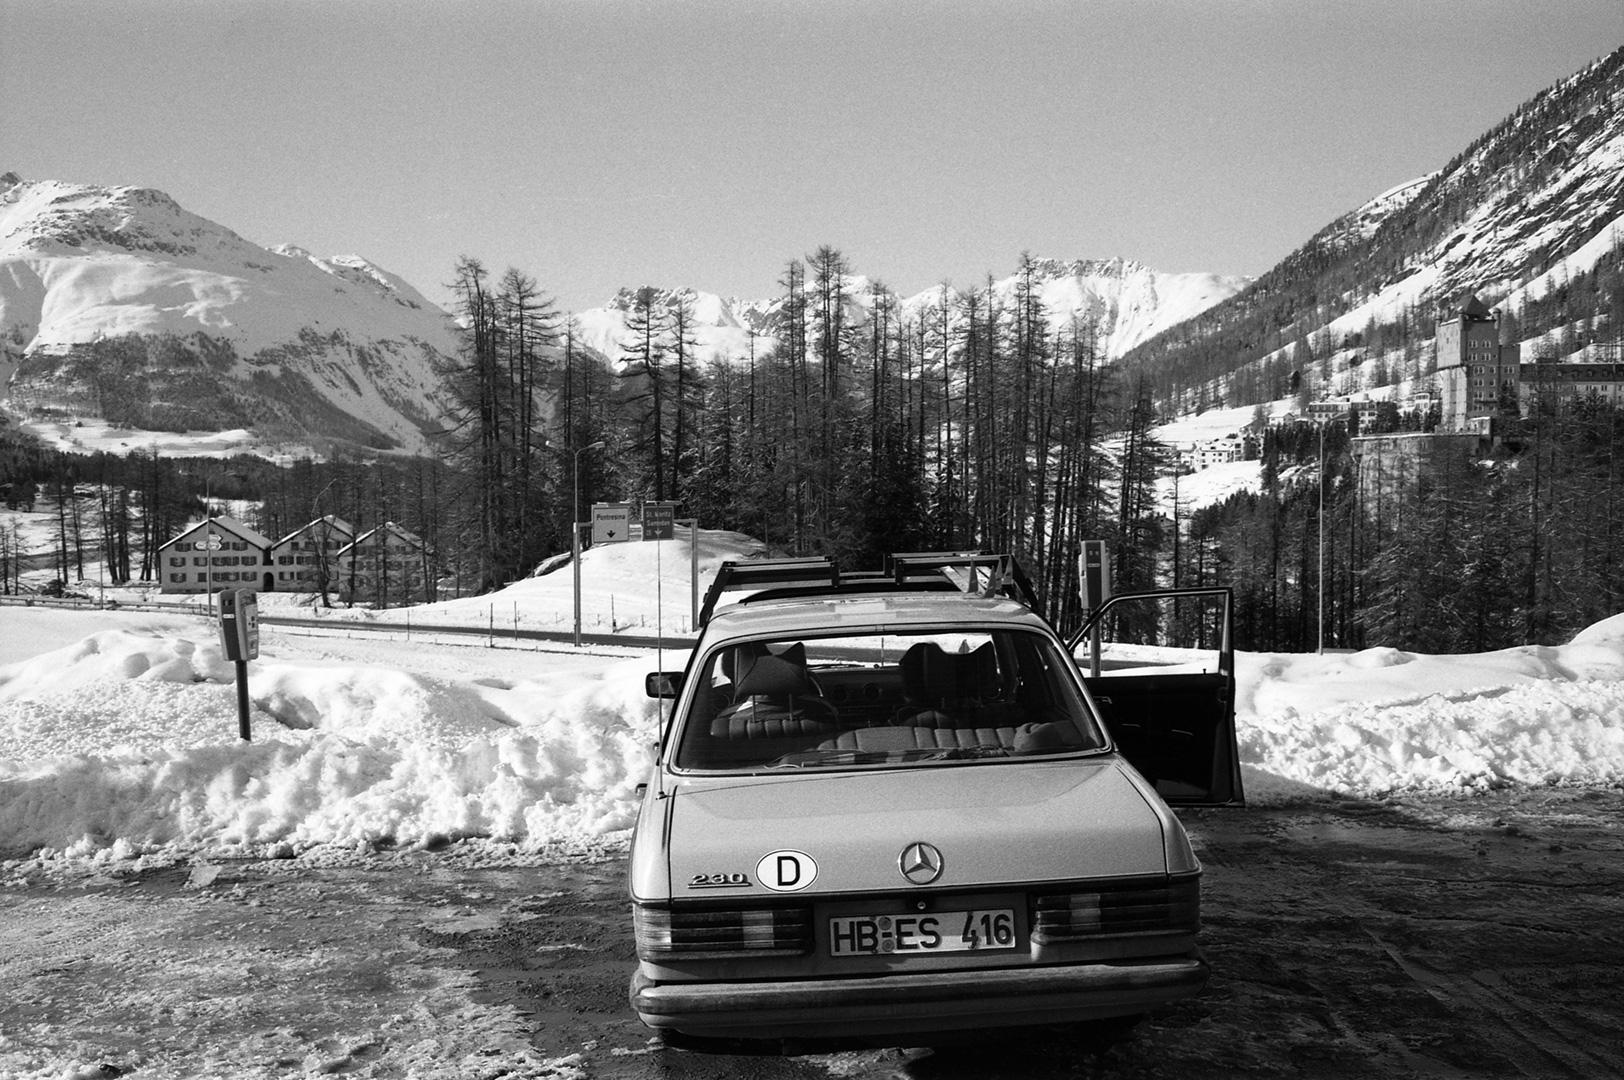 engadin-1982-1984_14_PONTRESINA_1984_08